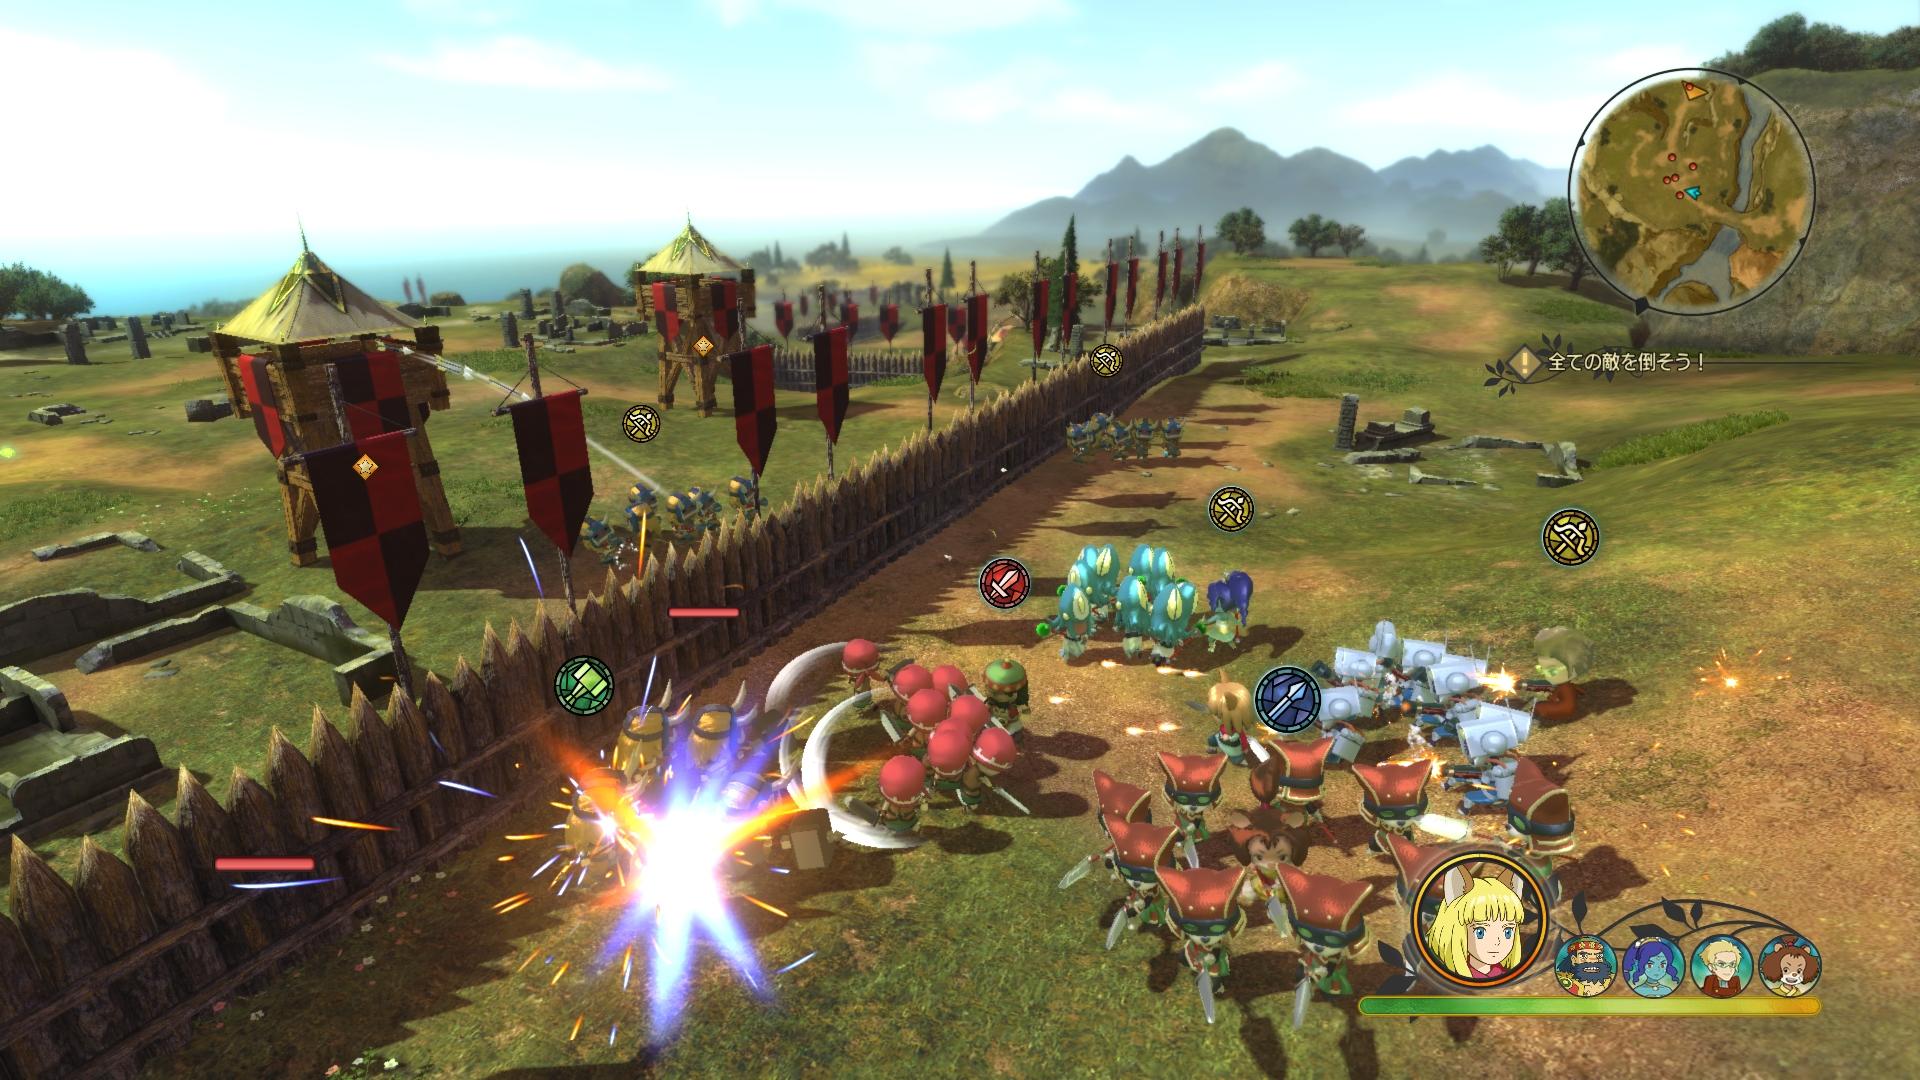 Ni no Kuni II: Revenant Kingdom v traileru a na screenshotech pro letošní Gamescom 148579